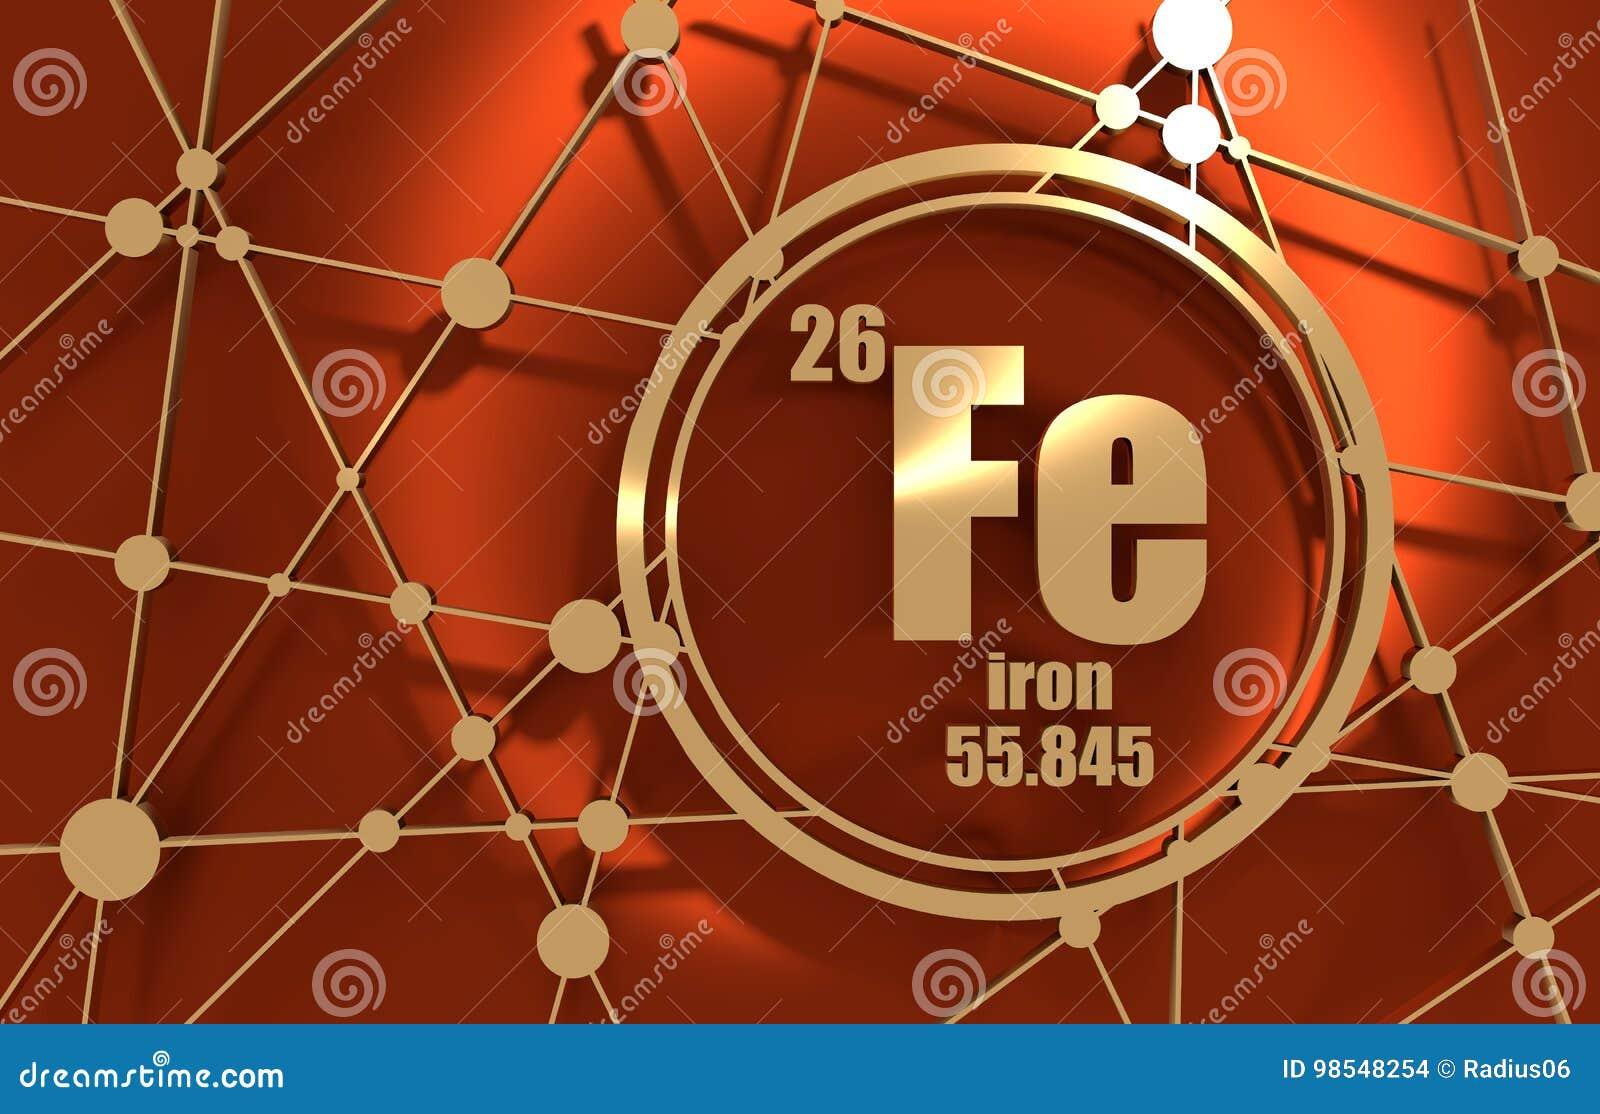 Iron Chemical Element Stock Illustration Illustration Of Element